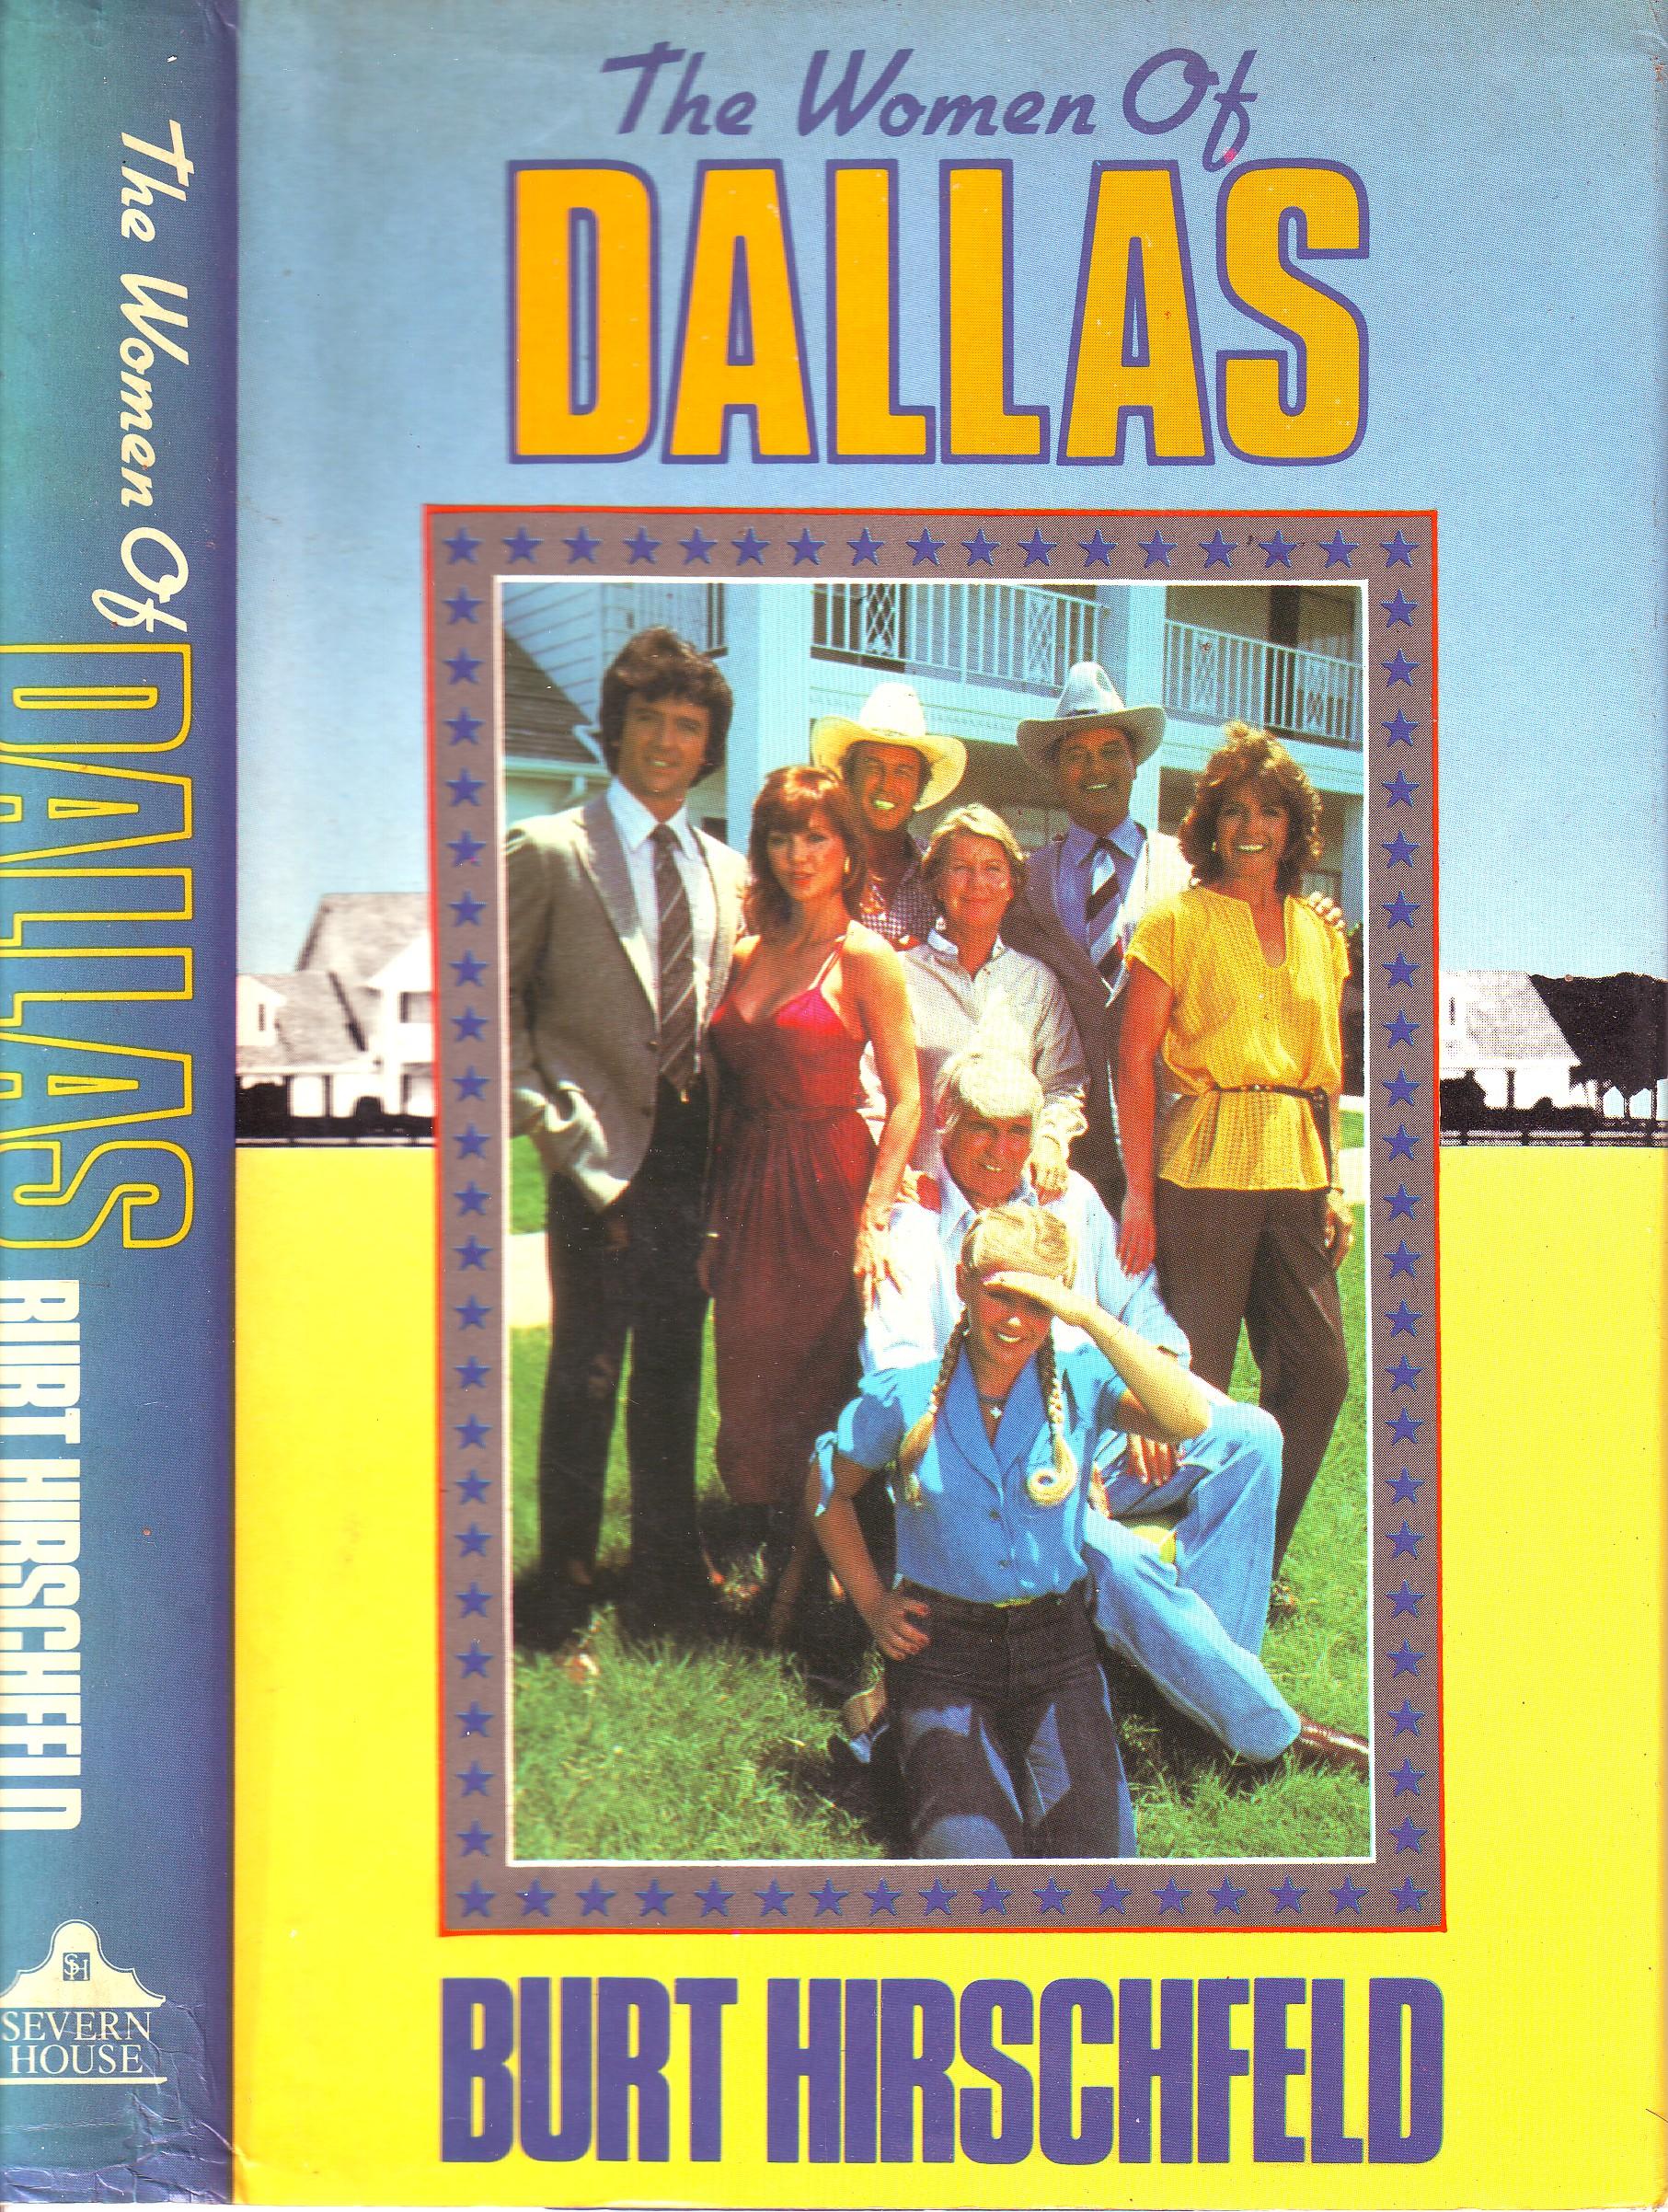 DALLAS, mon univers impitoyable ! - Page 2 Dallashirshfeld